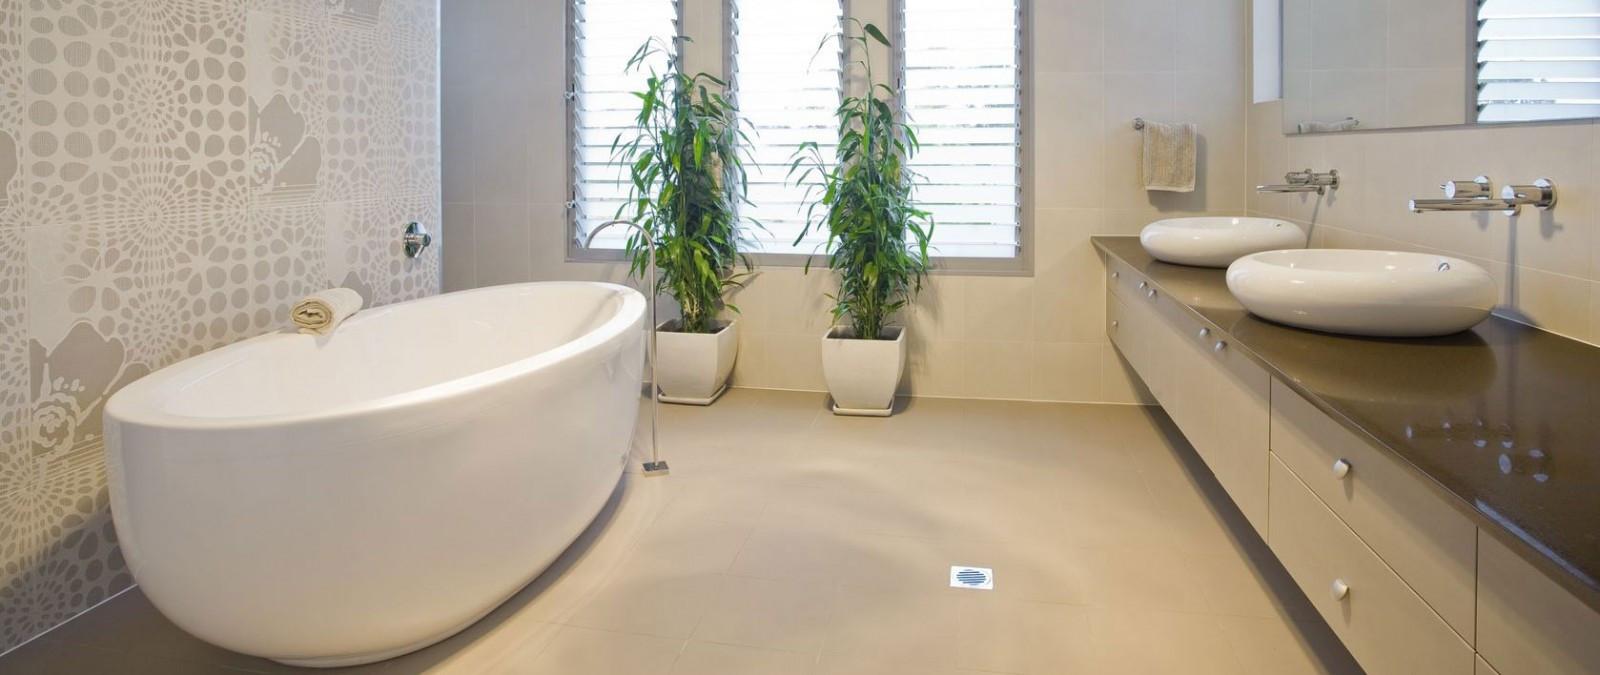 Schöne Bäder  Körber Heizung & Sanitär GmbH